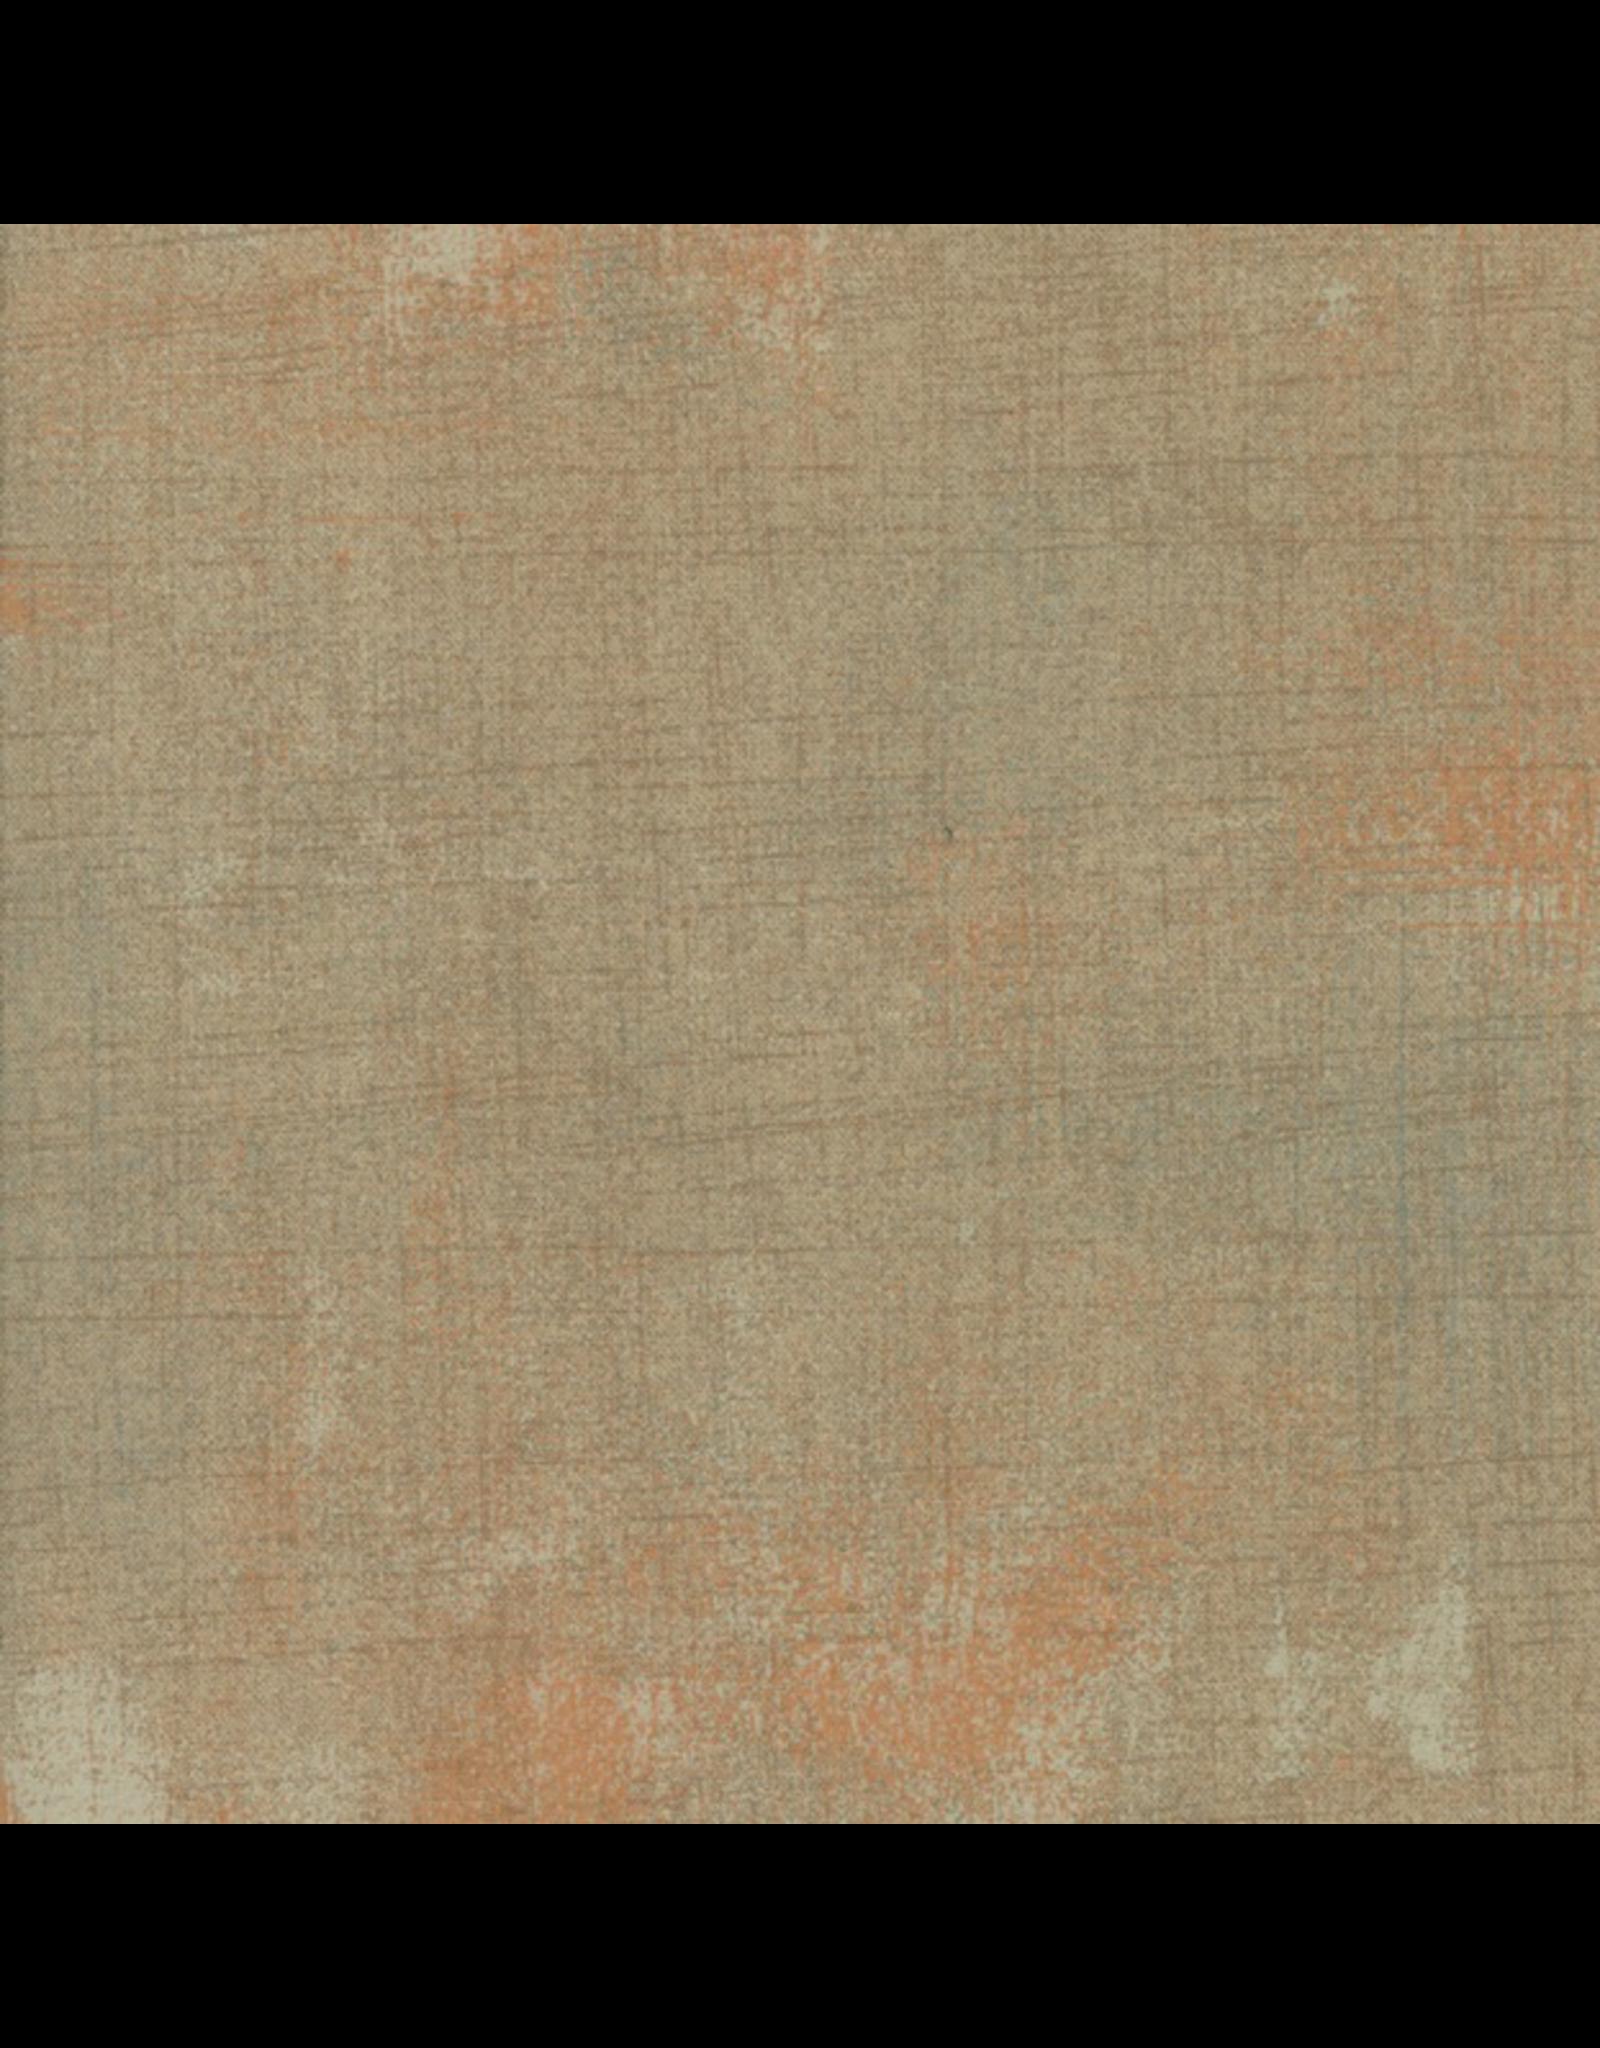 Moda Grunge in Maple Sugar, Fabric Half-Yards